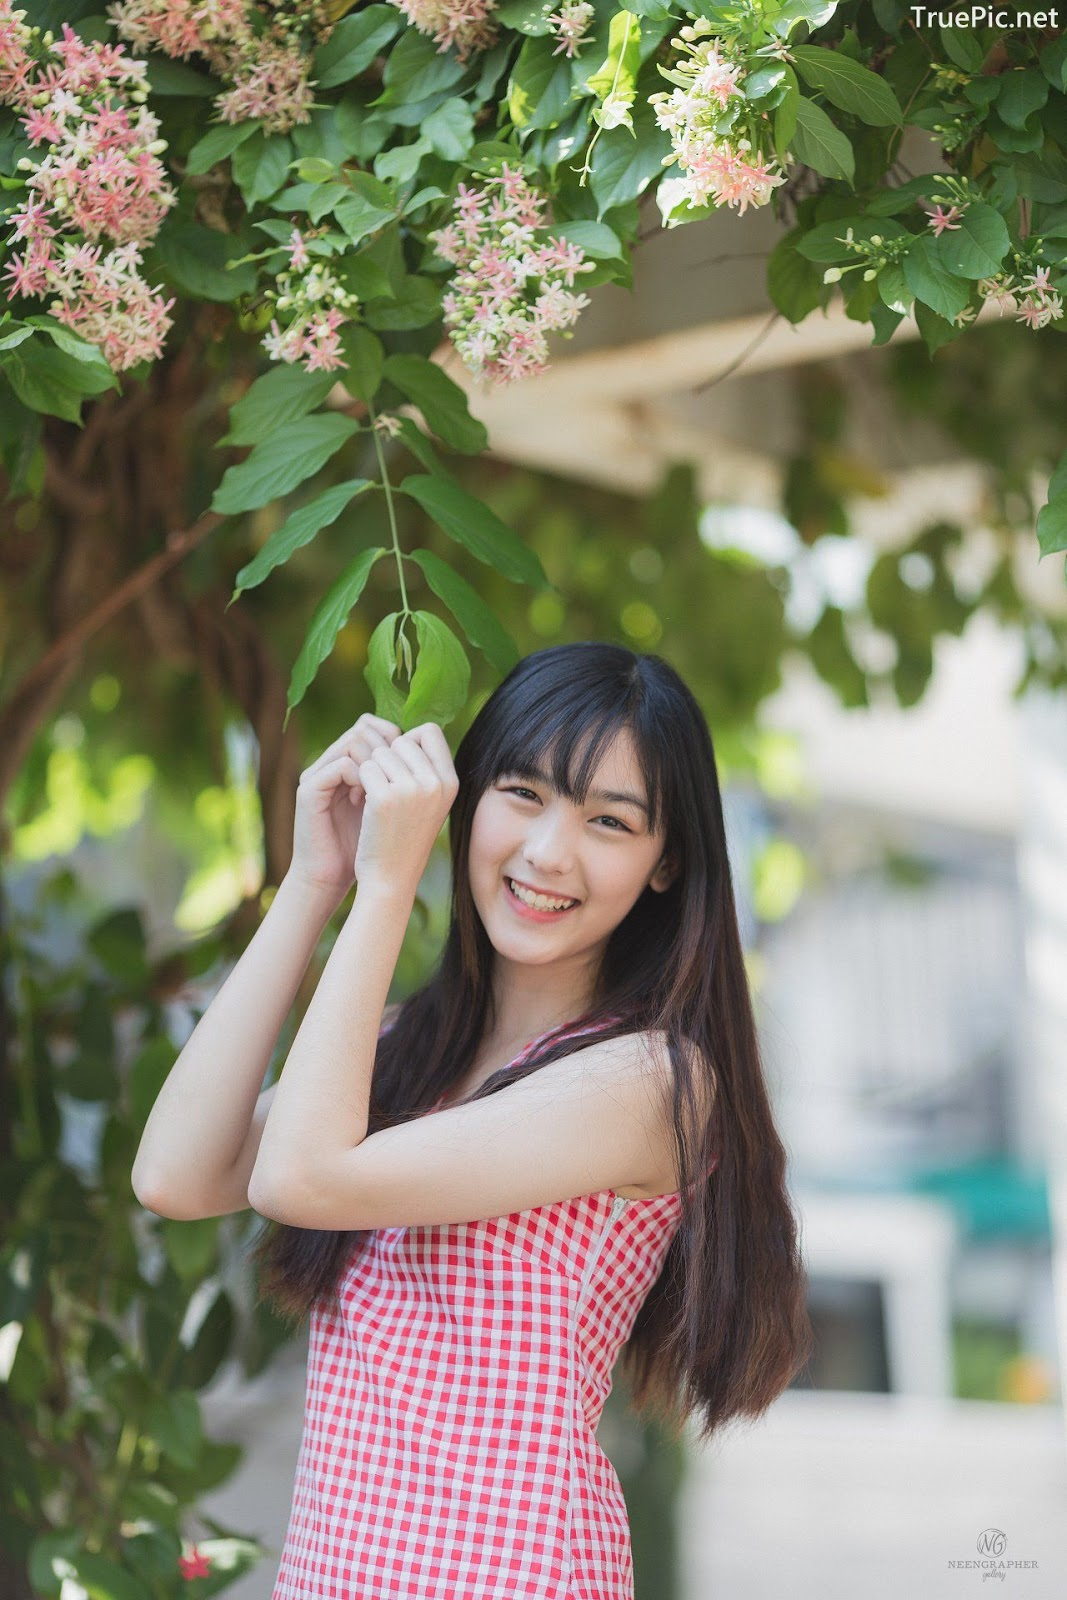 Image-Thailand-Cute-Model-Emma-Panisara–Album-Emma-Bright-Sunday-TruePic.net- Picture-10